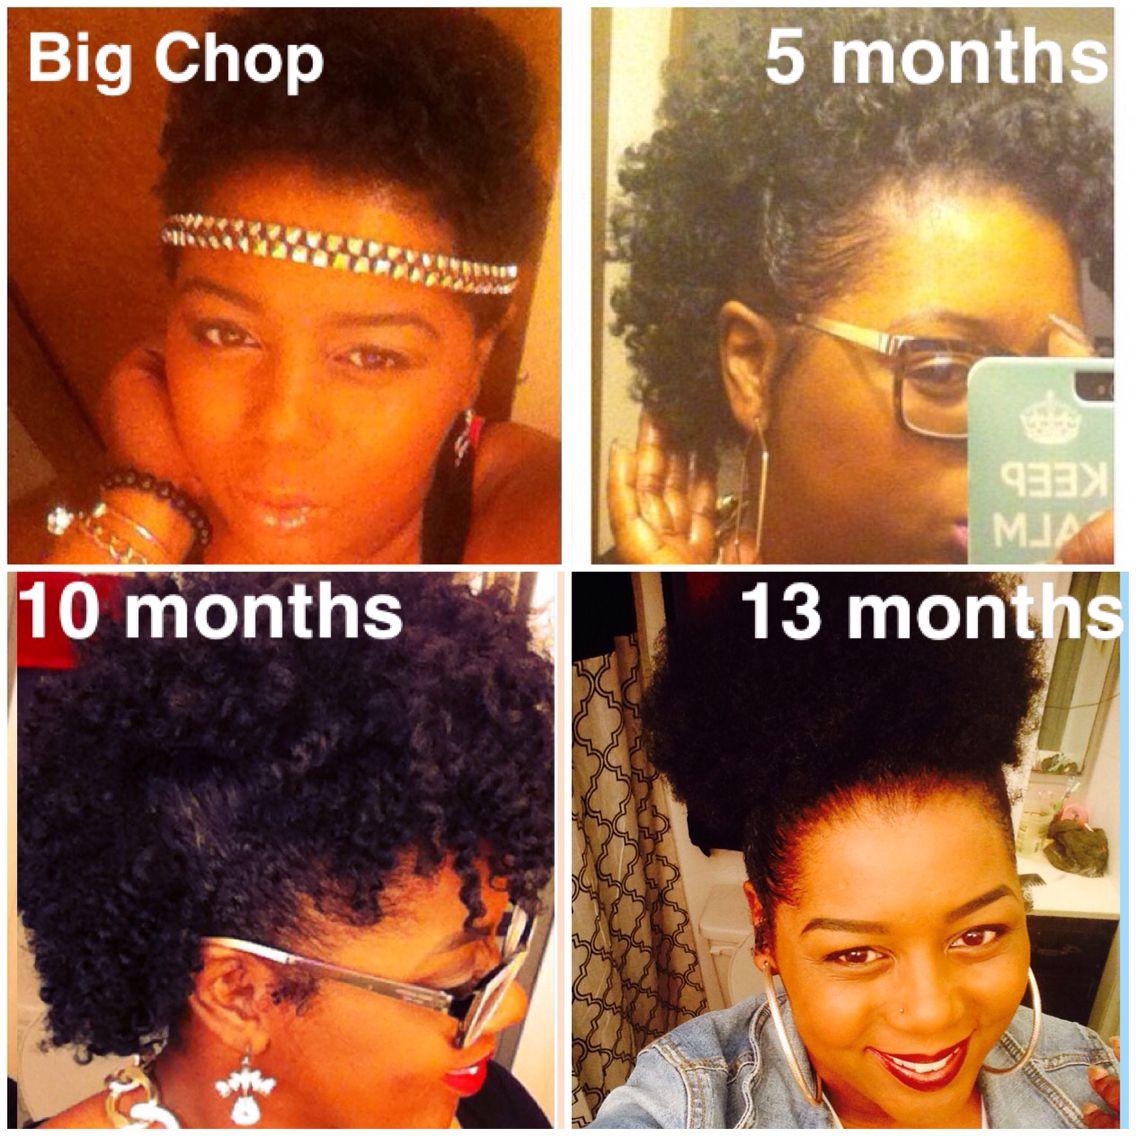 My natural hair journey. 41 months post big chop. Natural hair